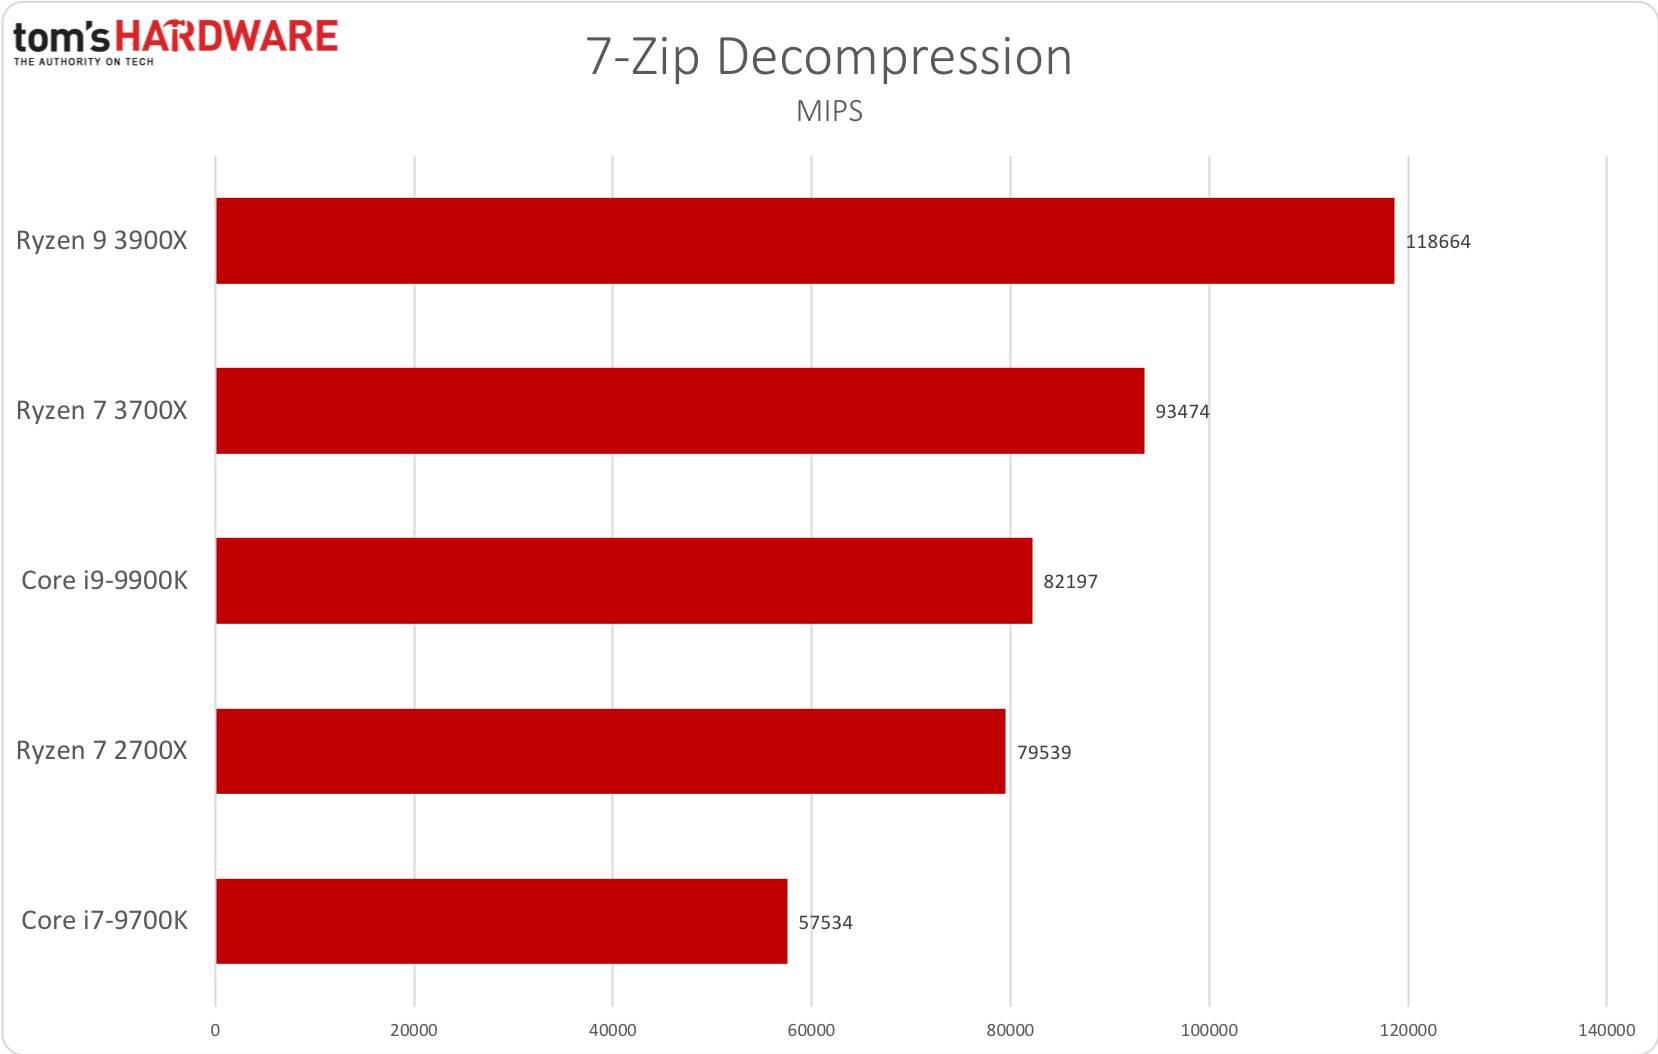 7-Zip Decompression